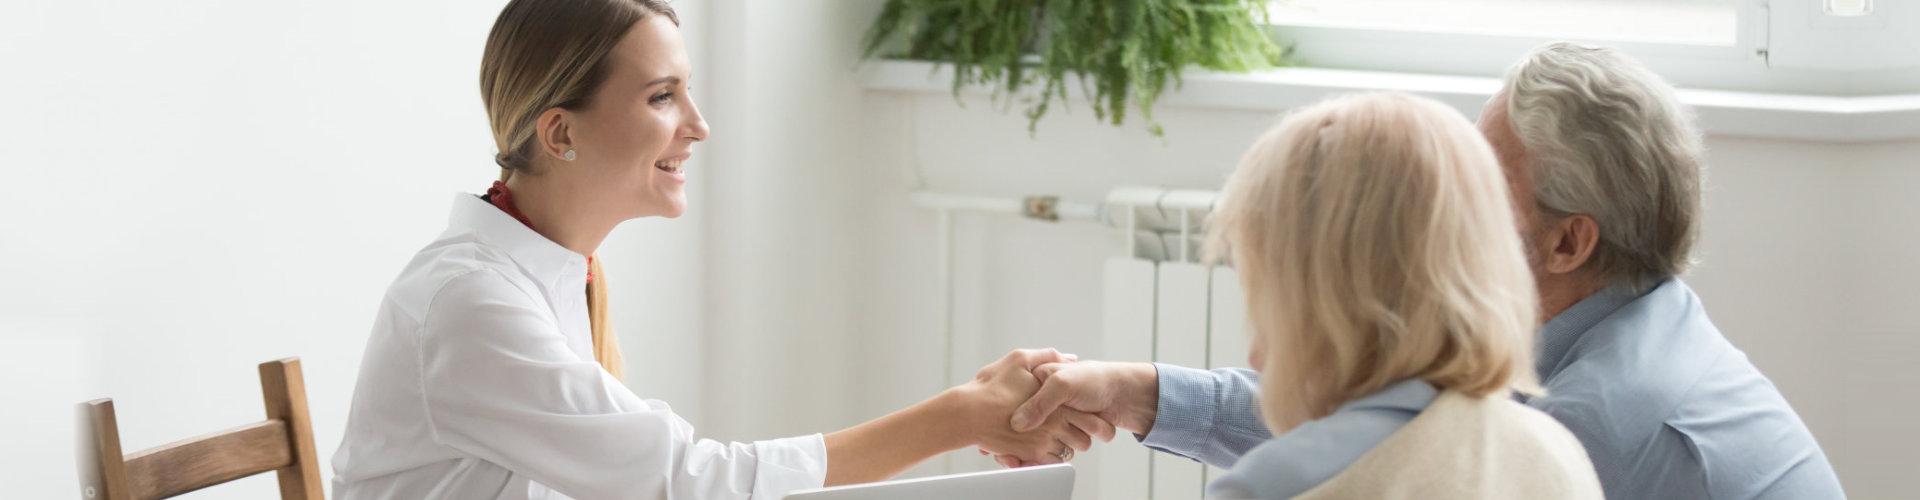 Smiling female lawyer, real estate agent or financial advisor handshaking older senior couple